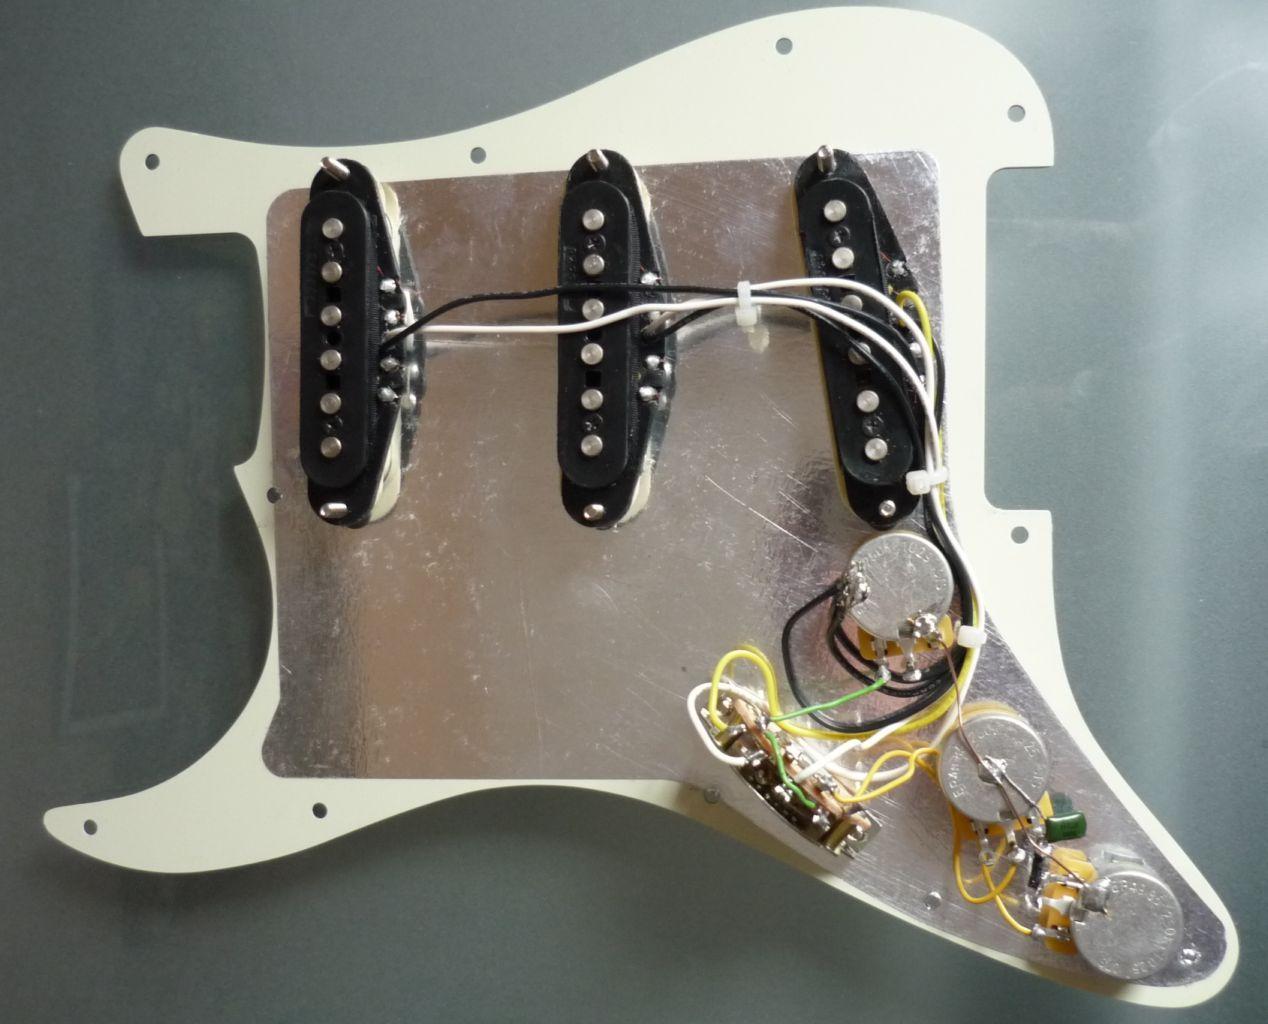 [DIAGRAM_0HG]  HZ_6570] Fender Noiseless Pickups Wiring Diagram Download Diagram | Fender Jeff Beck Stratocaster Wiring Diagram |  | Itis Itive Erbug Sputa Rous Cajos Licuk Mohammedshrine Librar Wiring 101